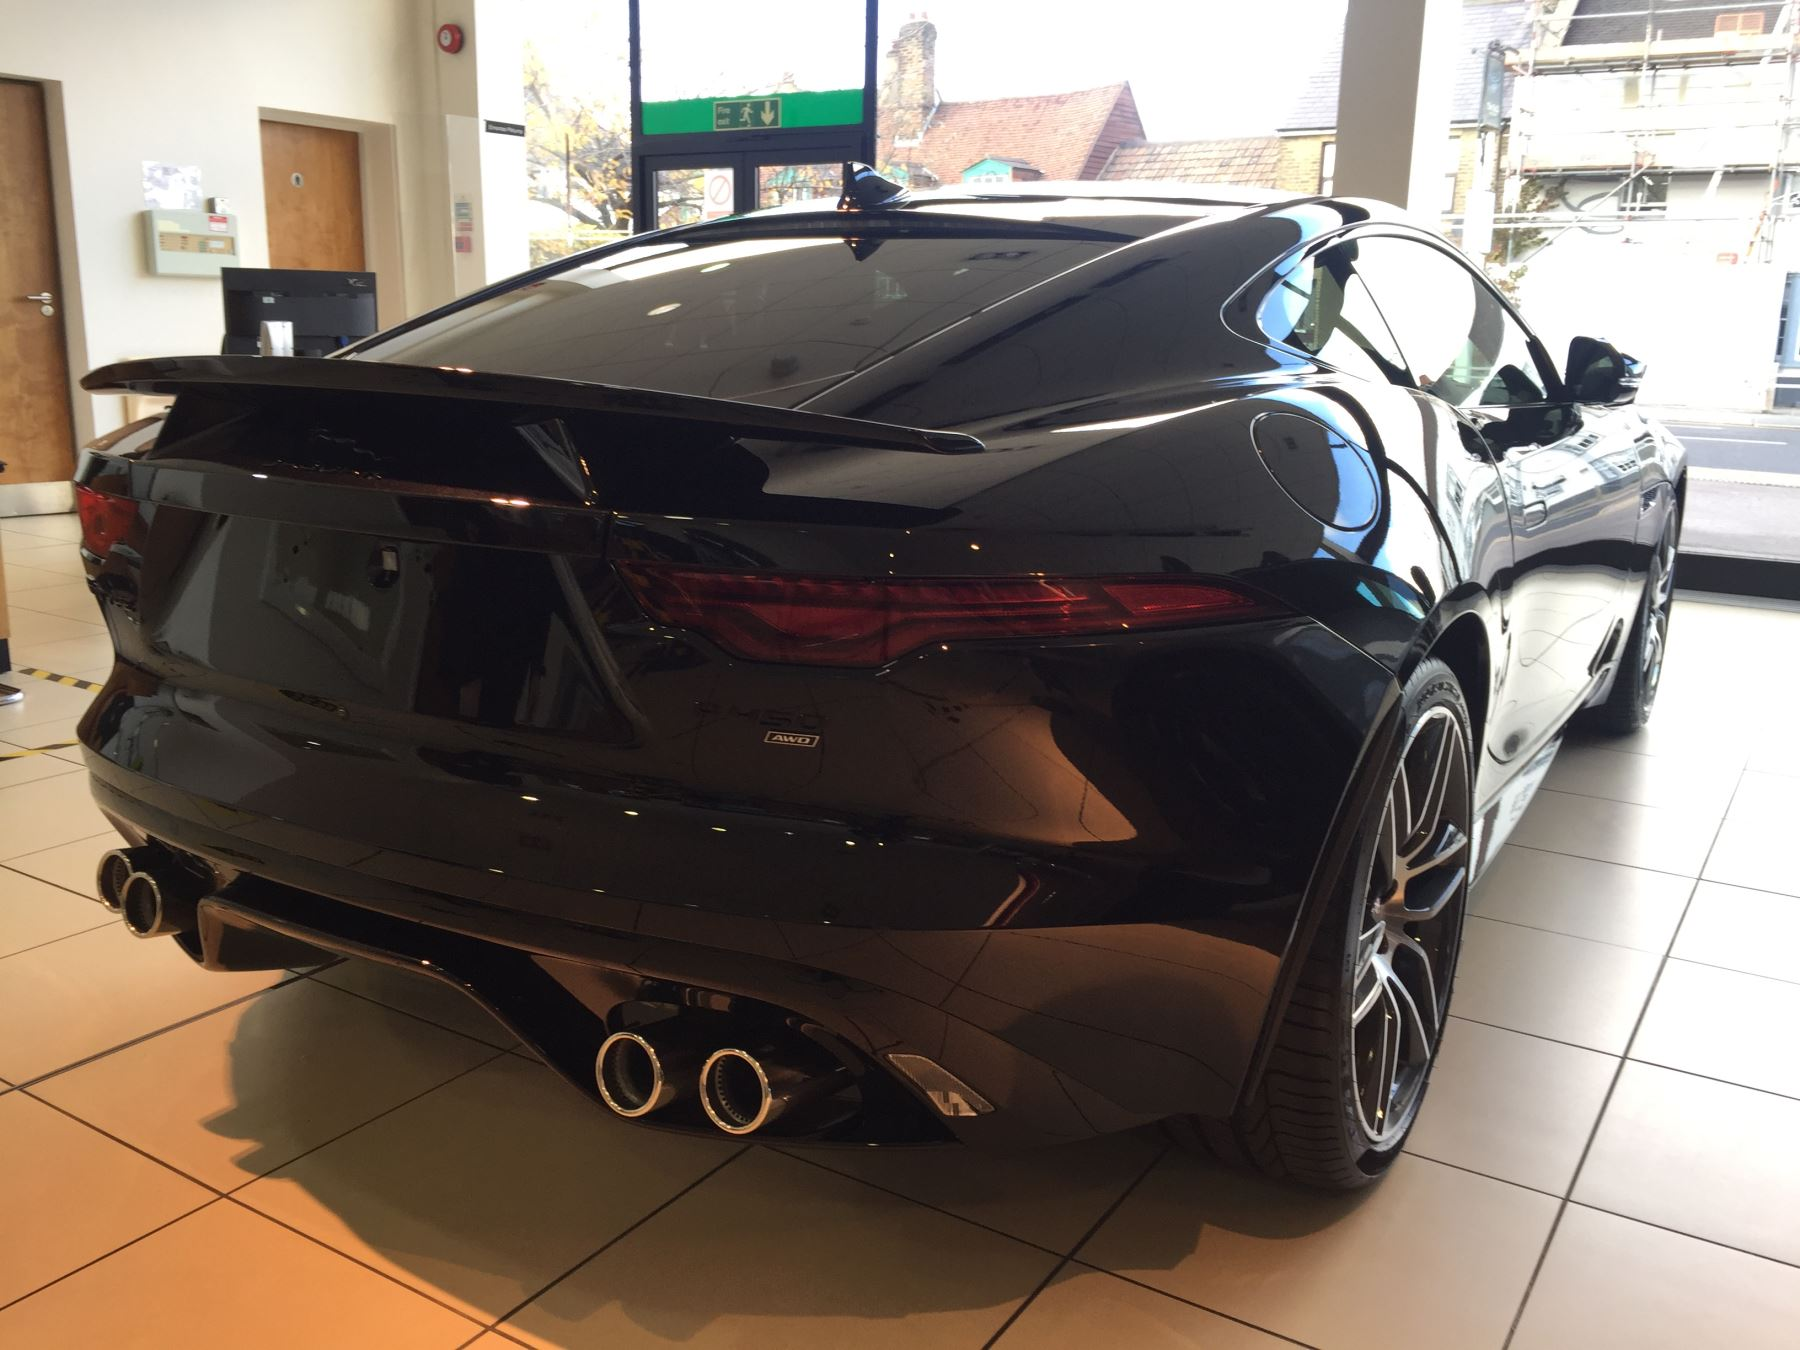 Jaguar F-TYPE 5.0 P450 Supercharged V8 R-Dynamic AWD image 7